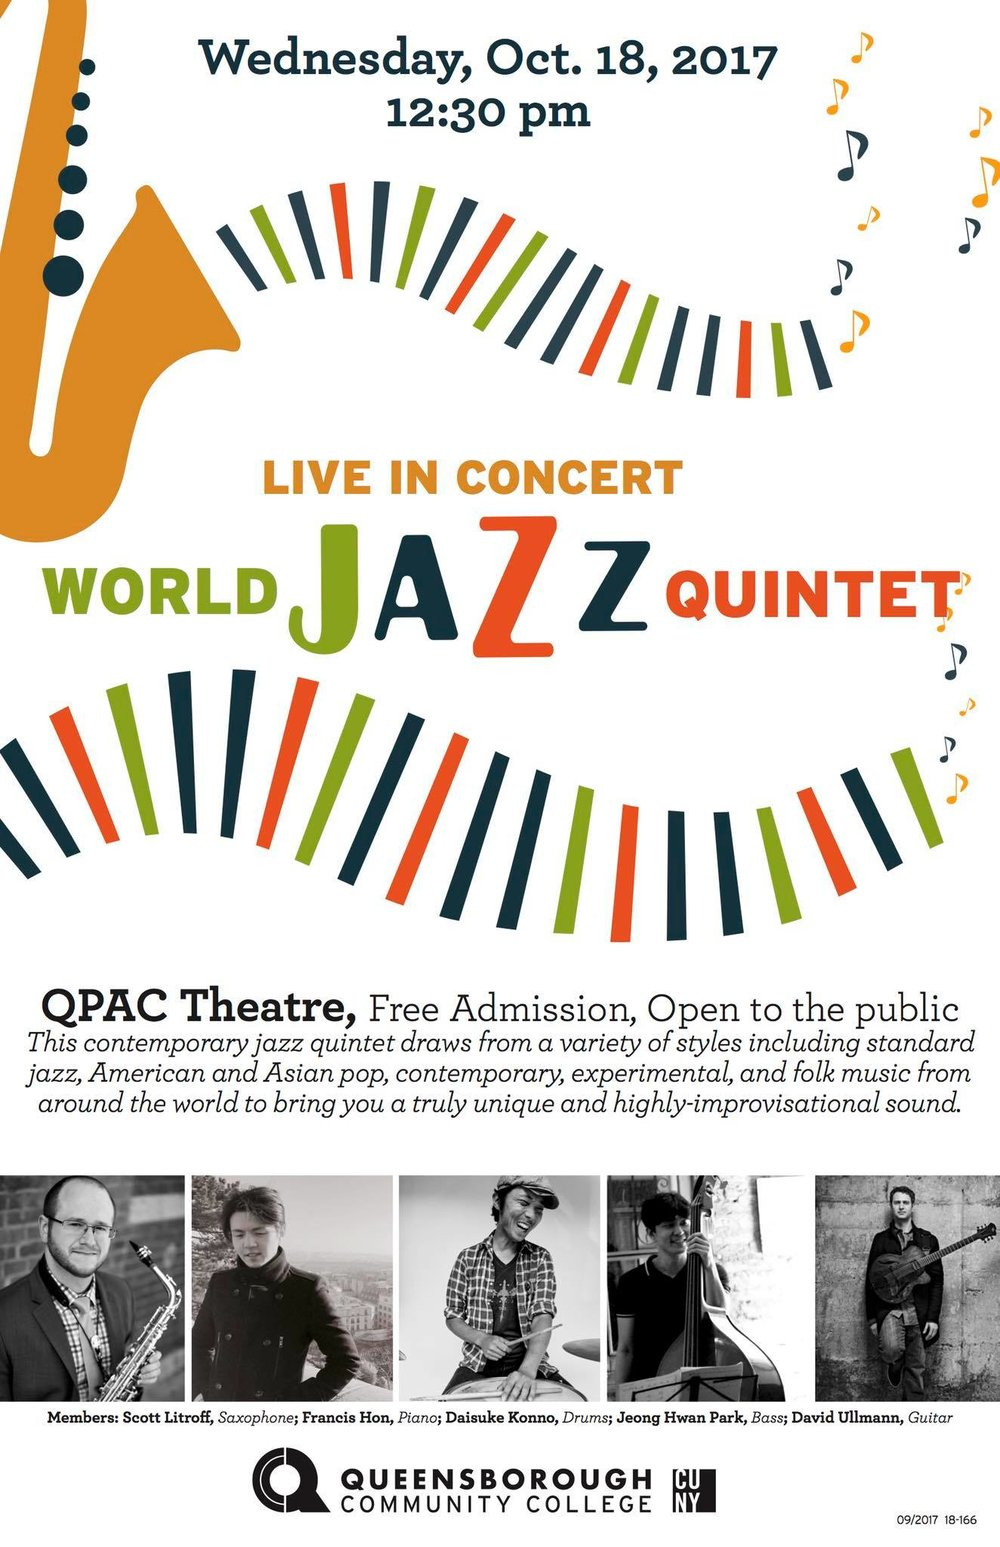 WJO QPAC Theatre Poster.jpg